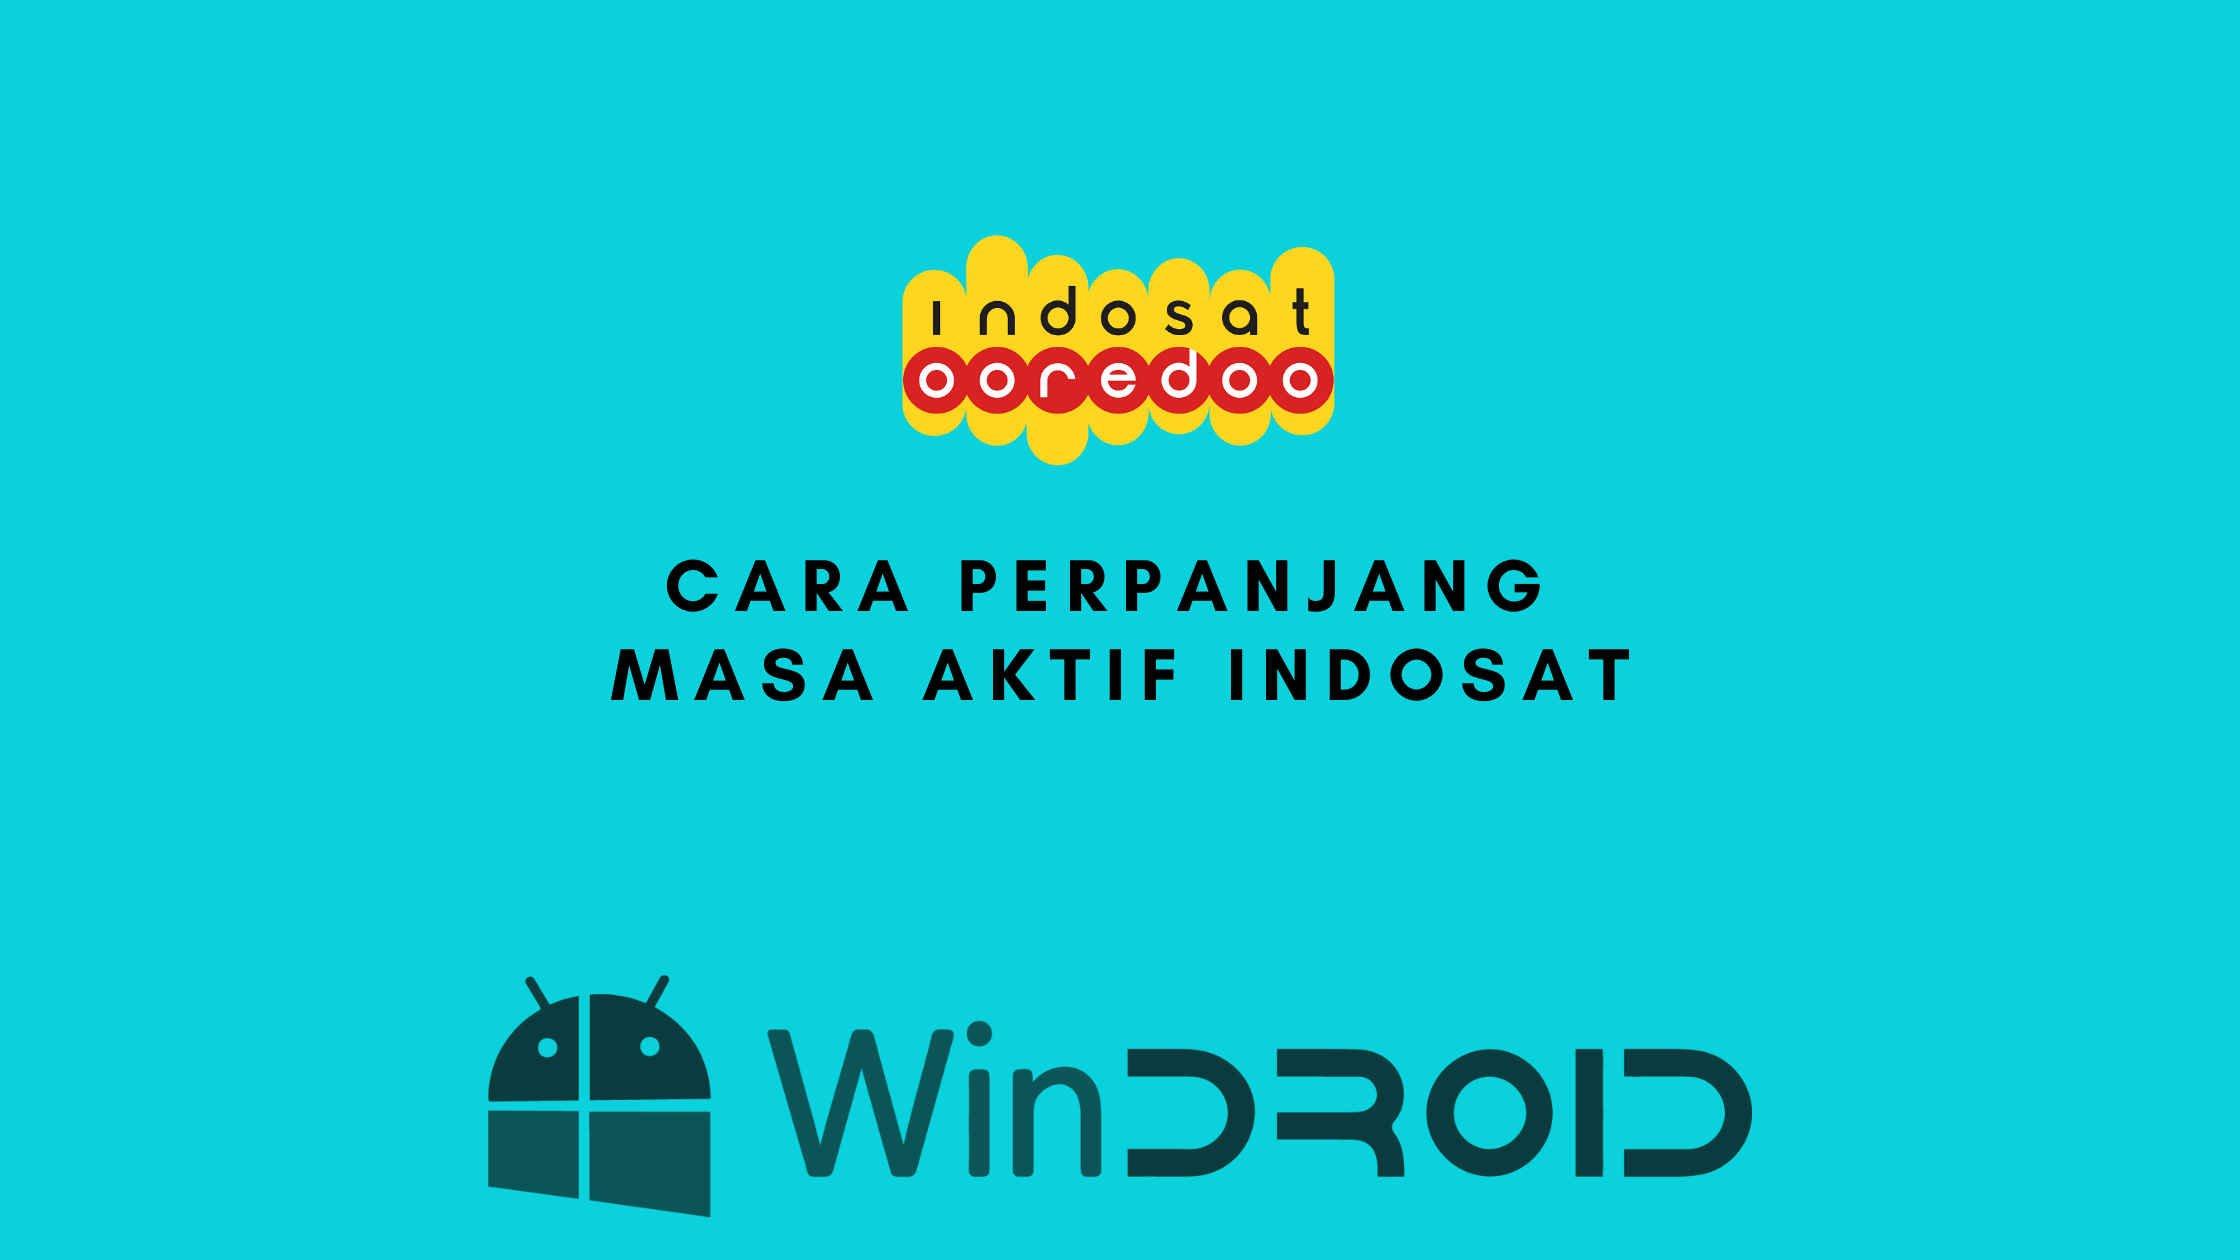 4 Cara Memperpanjang Masa Aktif Indosat Ooredoo 2021